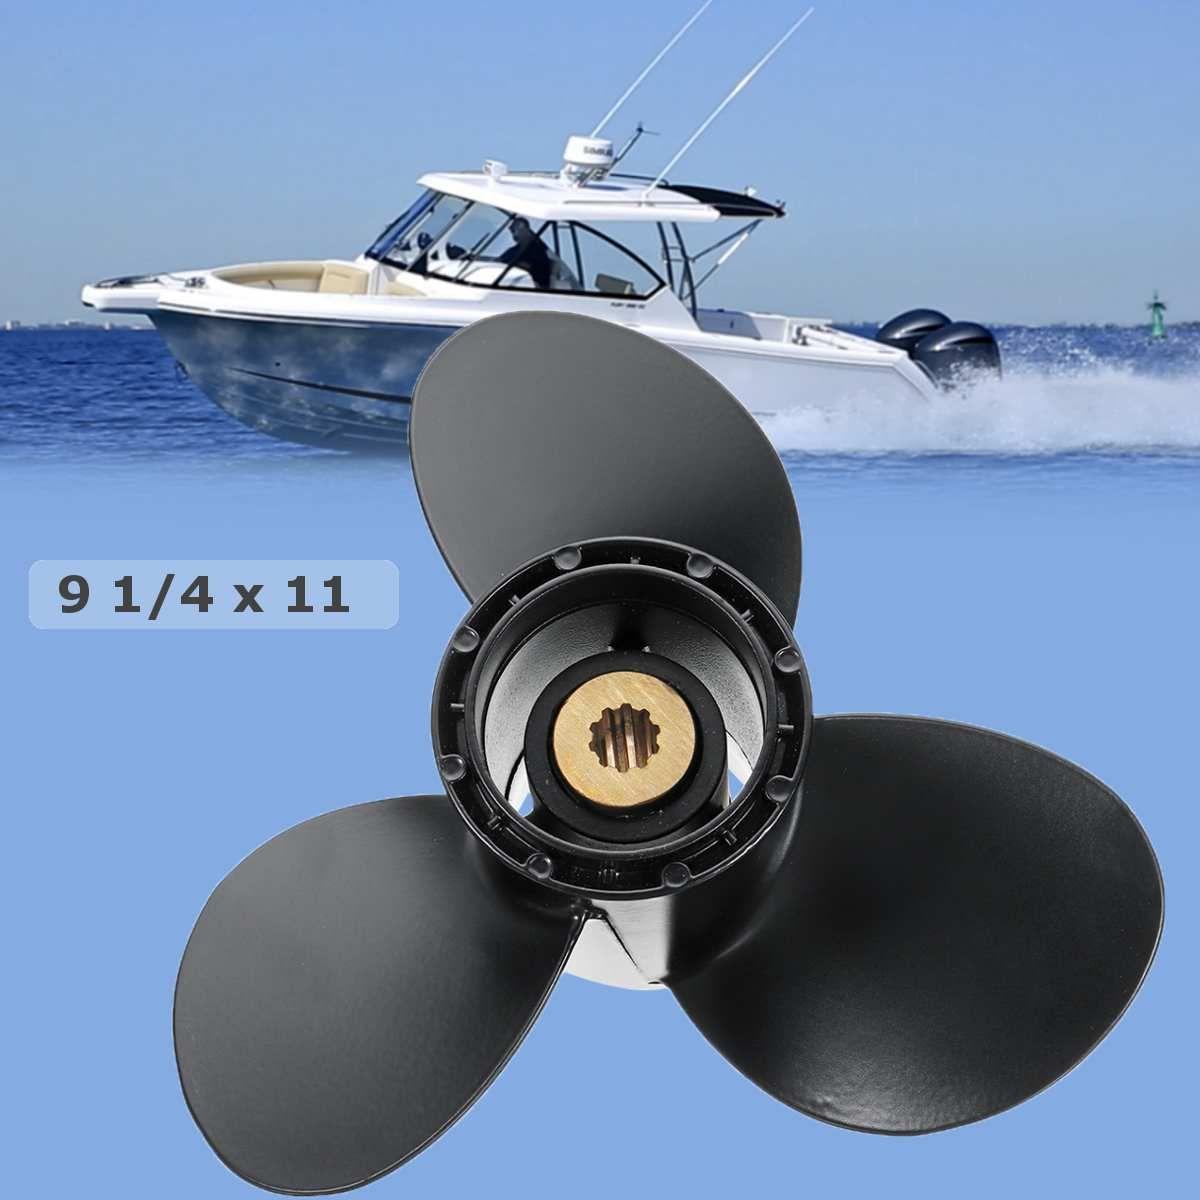 9 1/4 x 11 Aluminum Boat Outboard Propeller for Suzuki 9.9-15HP 58100-93743-019 Aluminium Alloy Black 3 Blades 10 Spline Tooth